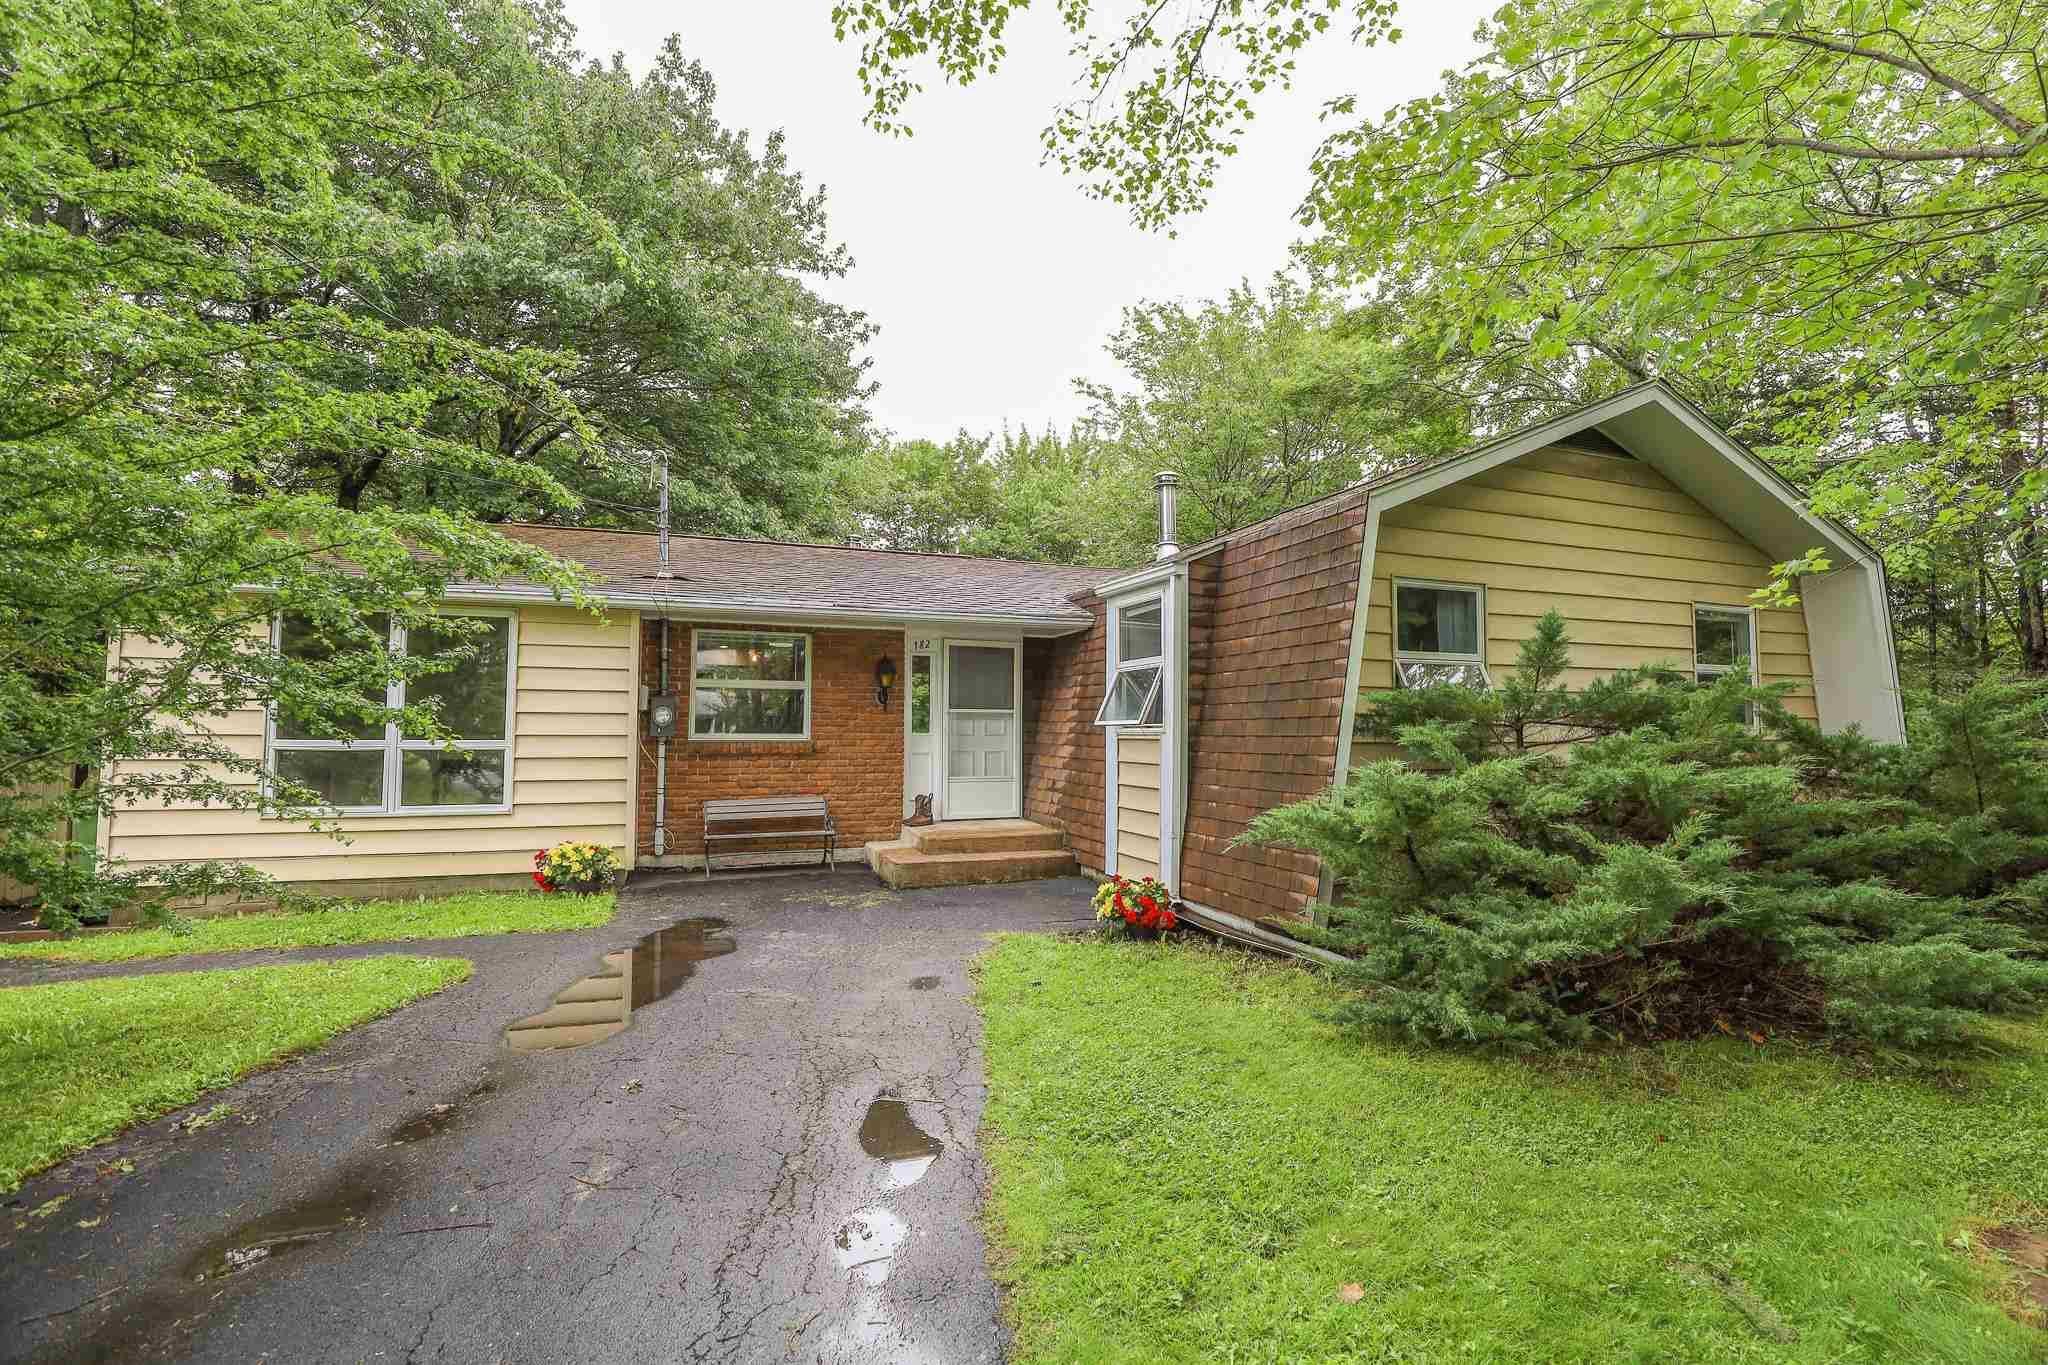 Main Photo: 182 Pinetree Crescent in Hammonds Plains: 21-Kingswood, Haliburton Hills, Hammonds Pl. Residential for sale (Halifax-Dartmouth)  : MLS®# 202117297